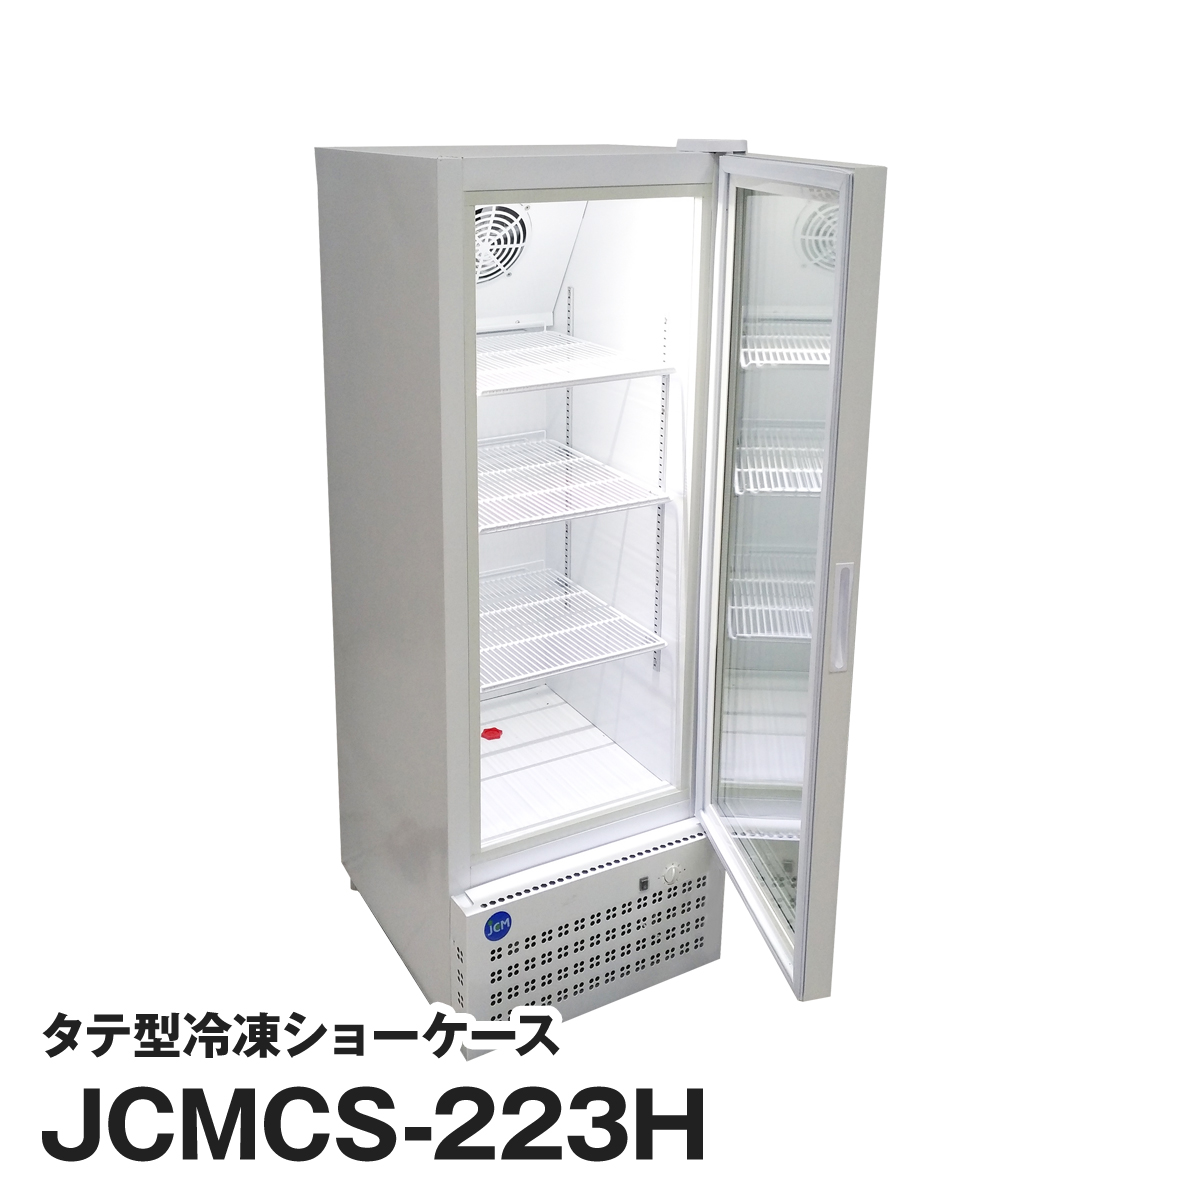 JCM社製 業務用 保冷庫 冷凍庫223L タテ型冷凍ショーケース JCMCS-223H 新品